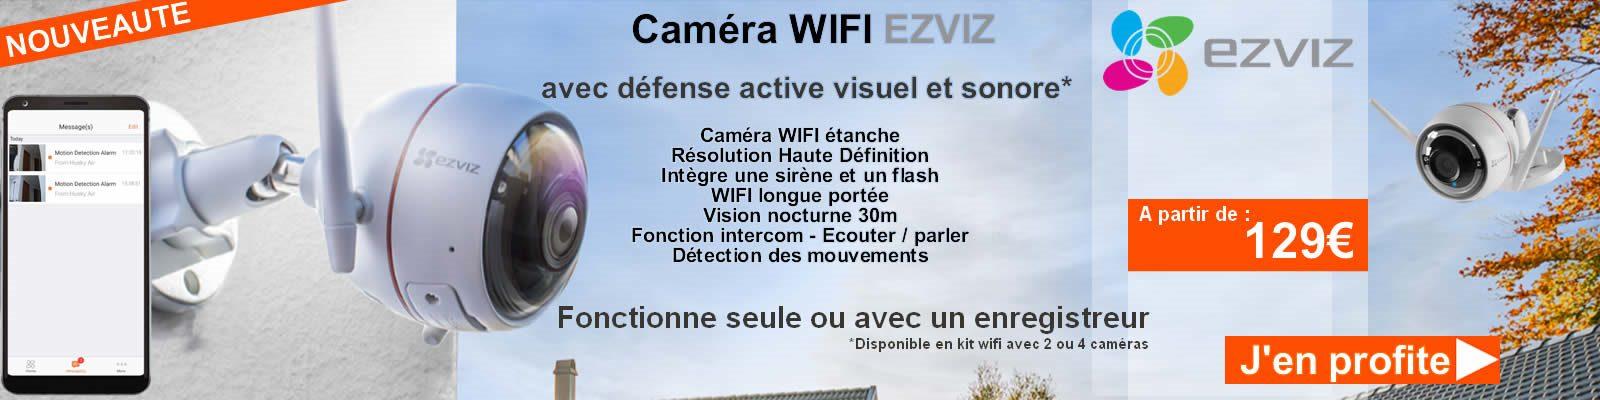 EZVIZ vidéo surveillance